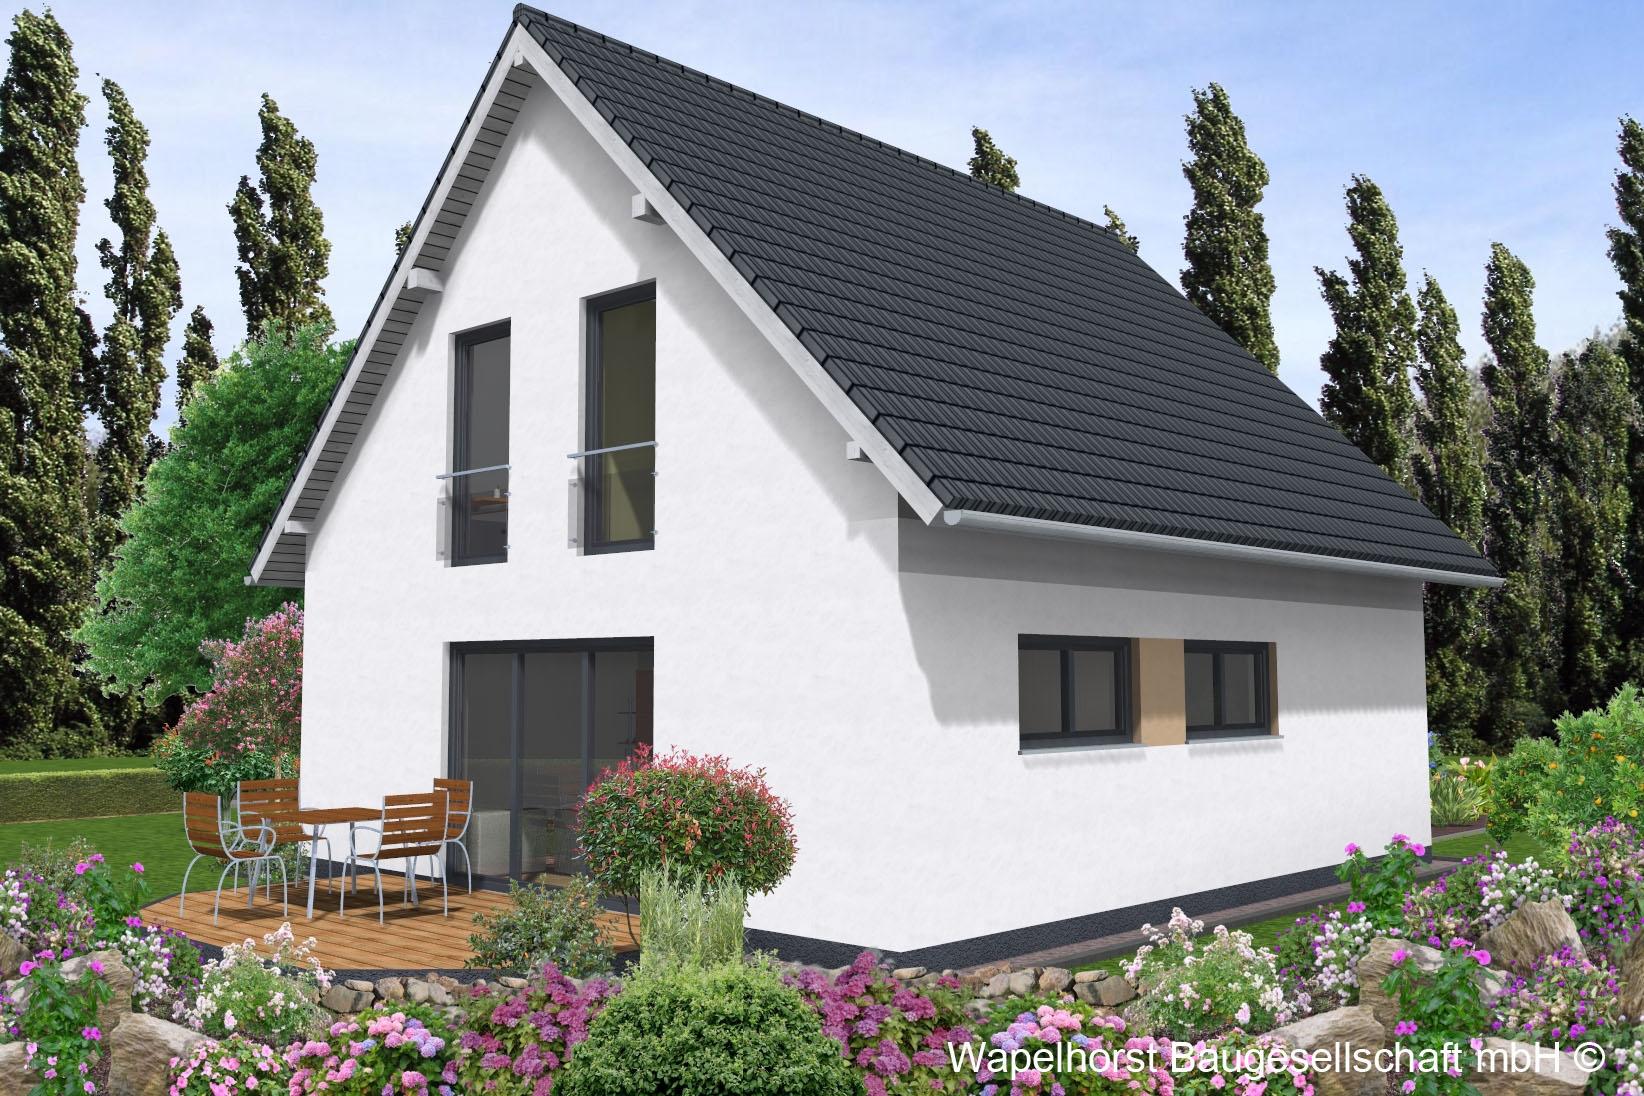 efh 1 10 garten wapelhorst planen und bauen m hnesee soest. Black Bedroom Furniture Sets. Home Design Ideas